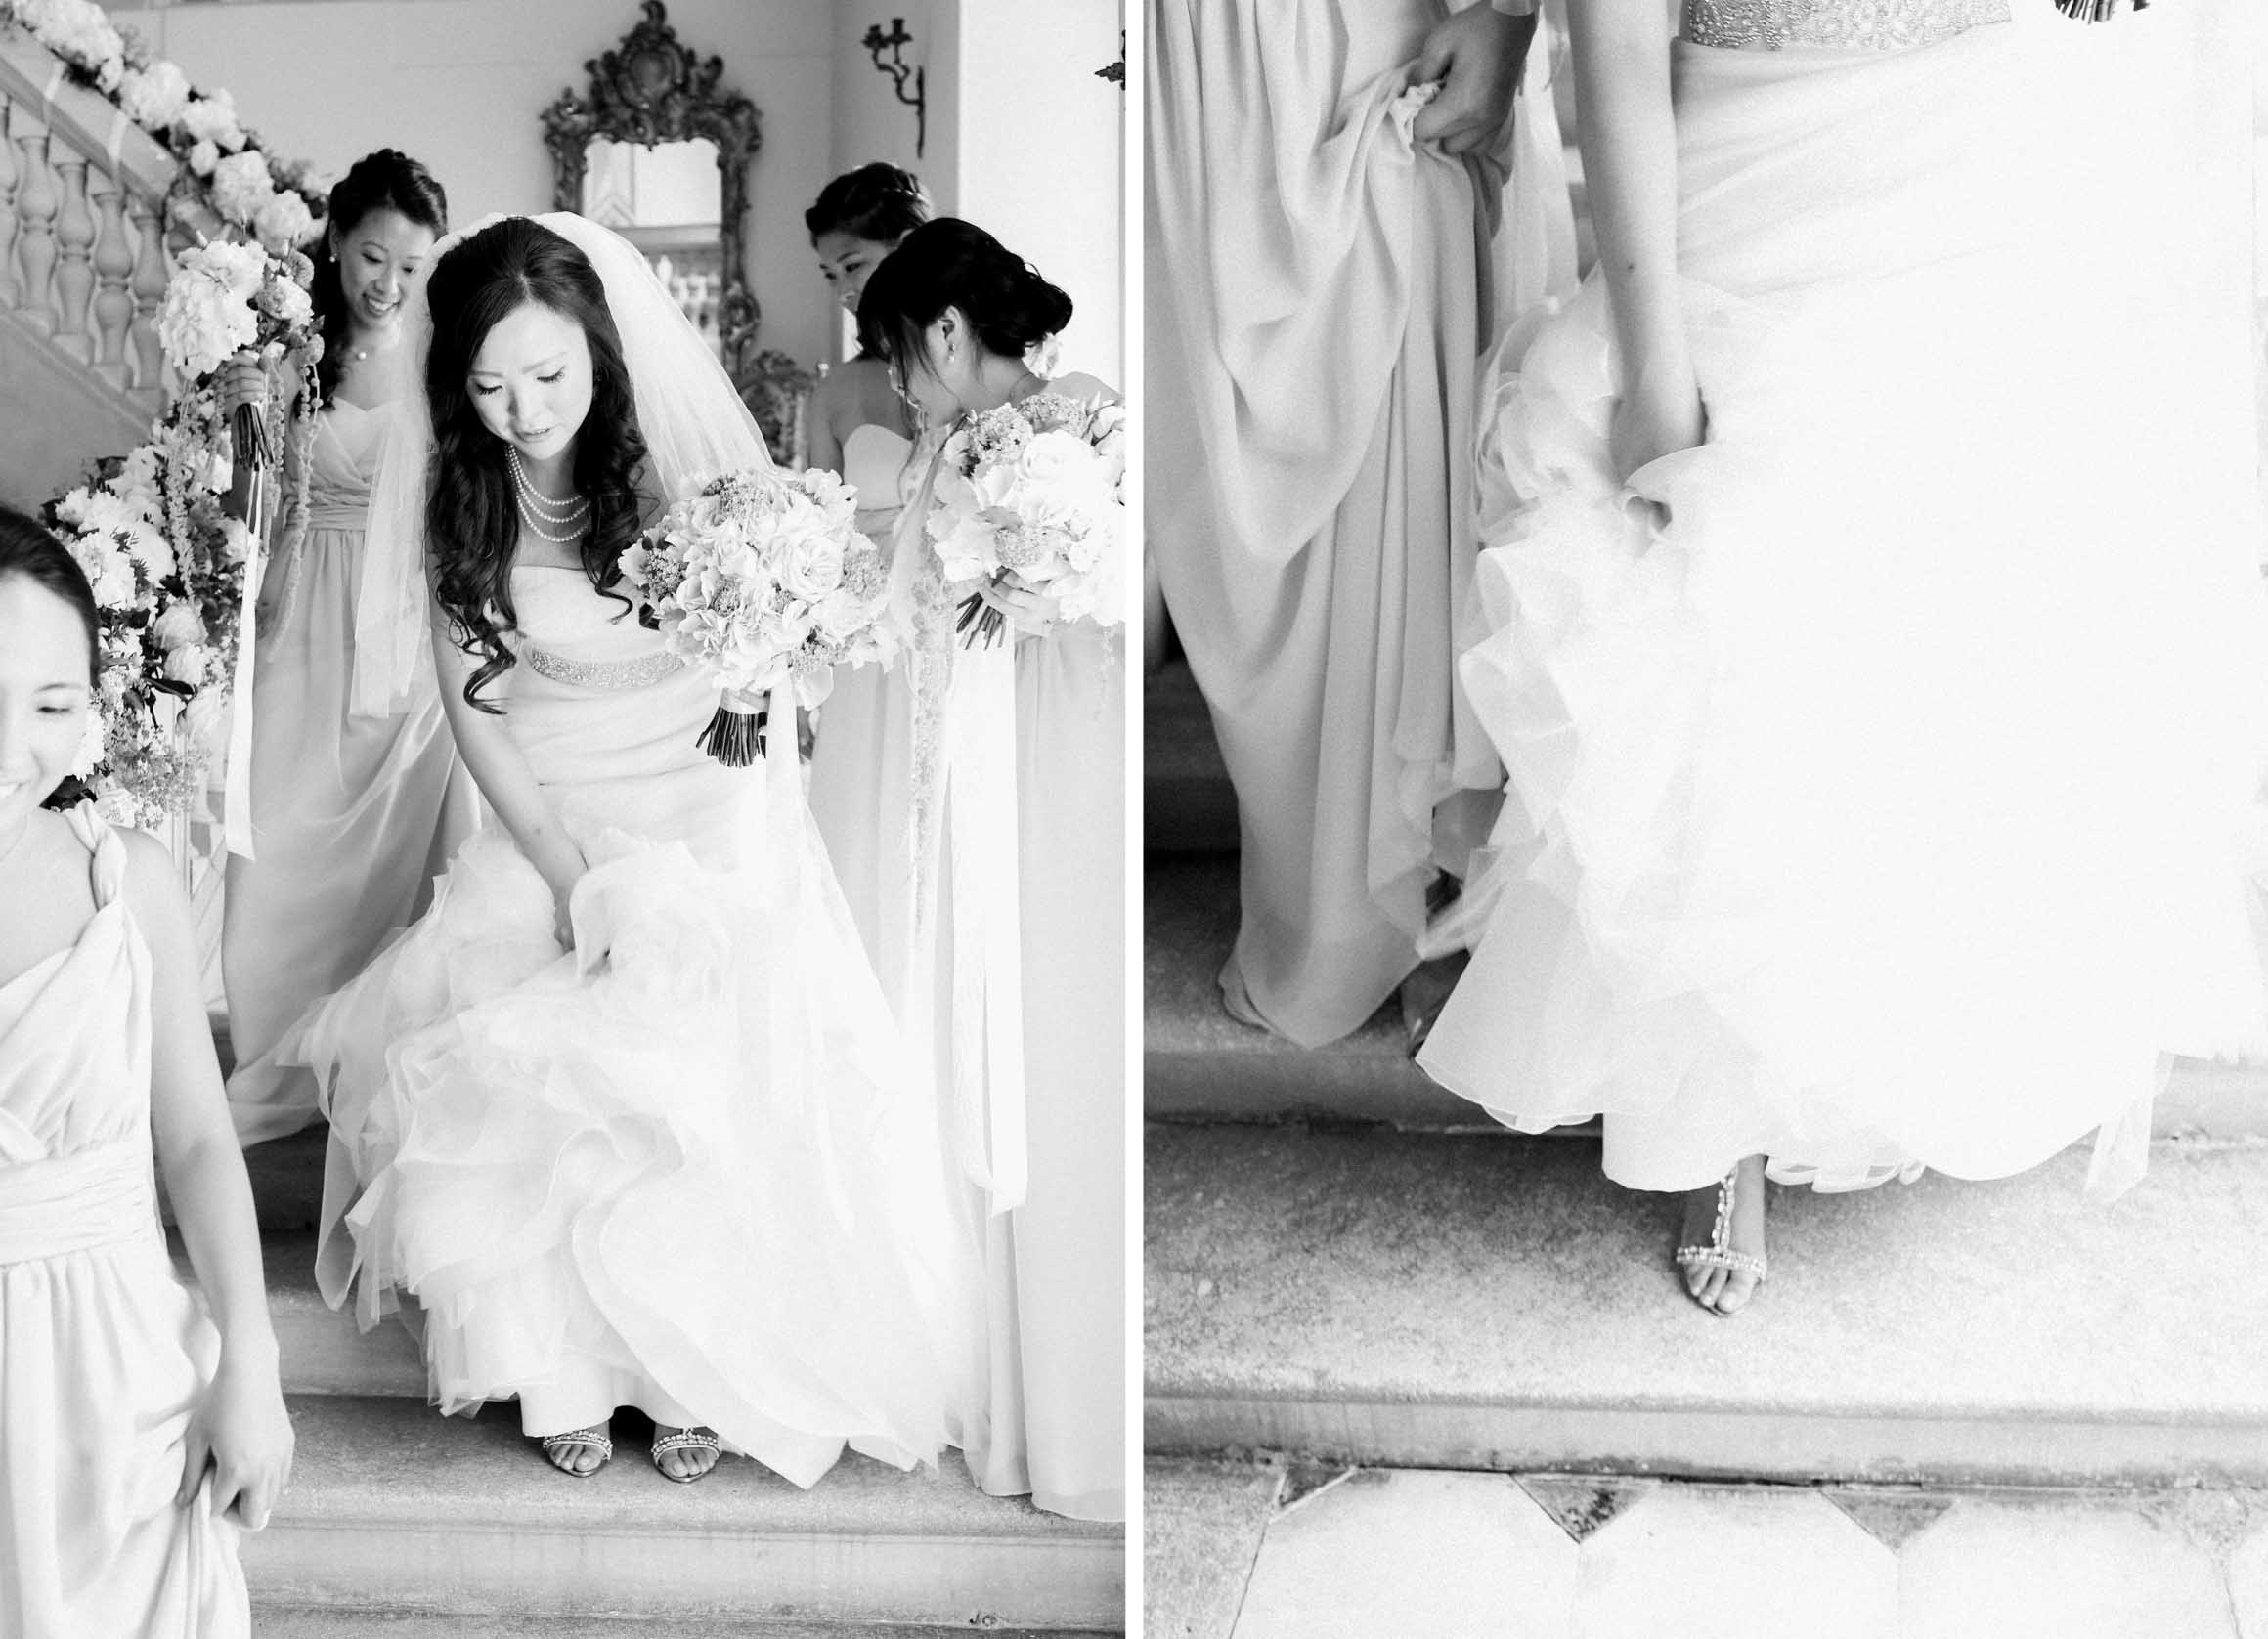 Amy O'Boyle Photography- Destination & UK Fine Art Film Wedding Photographer- Chateau La Durantie Wedding 19.jpg